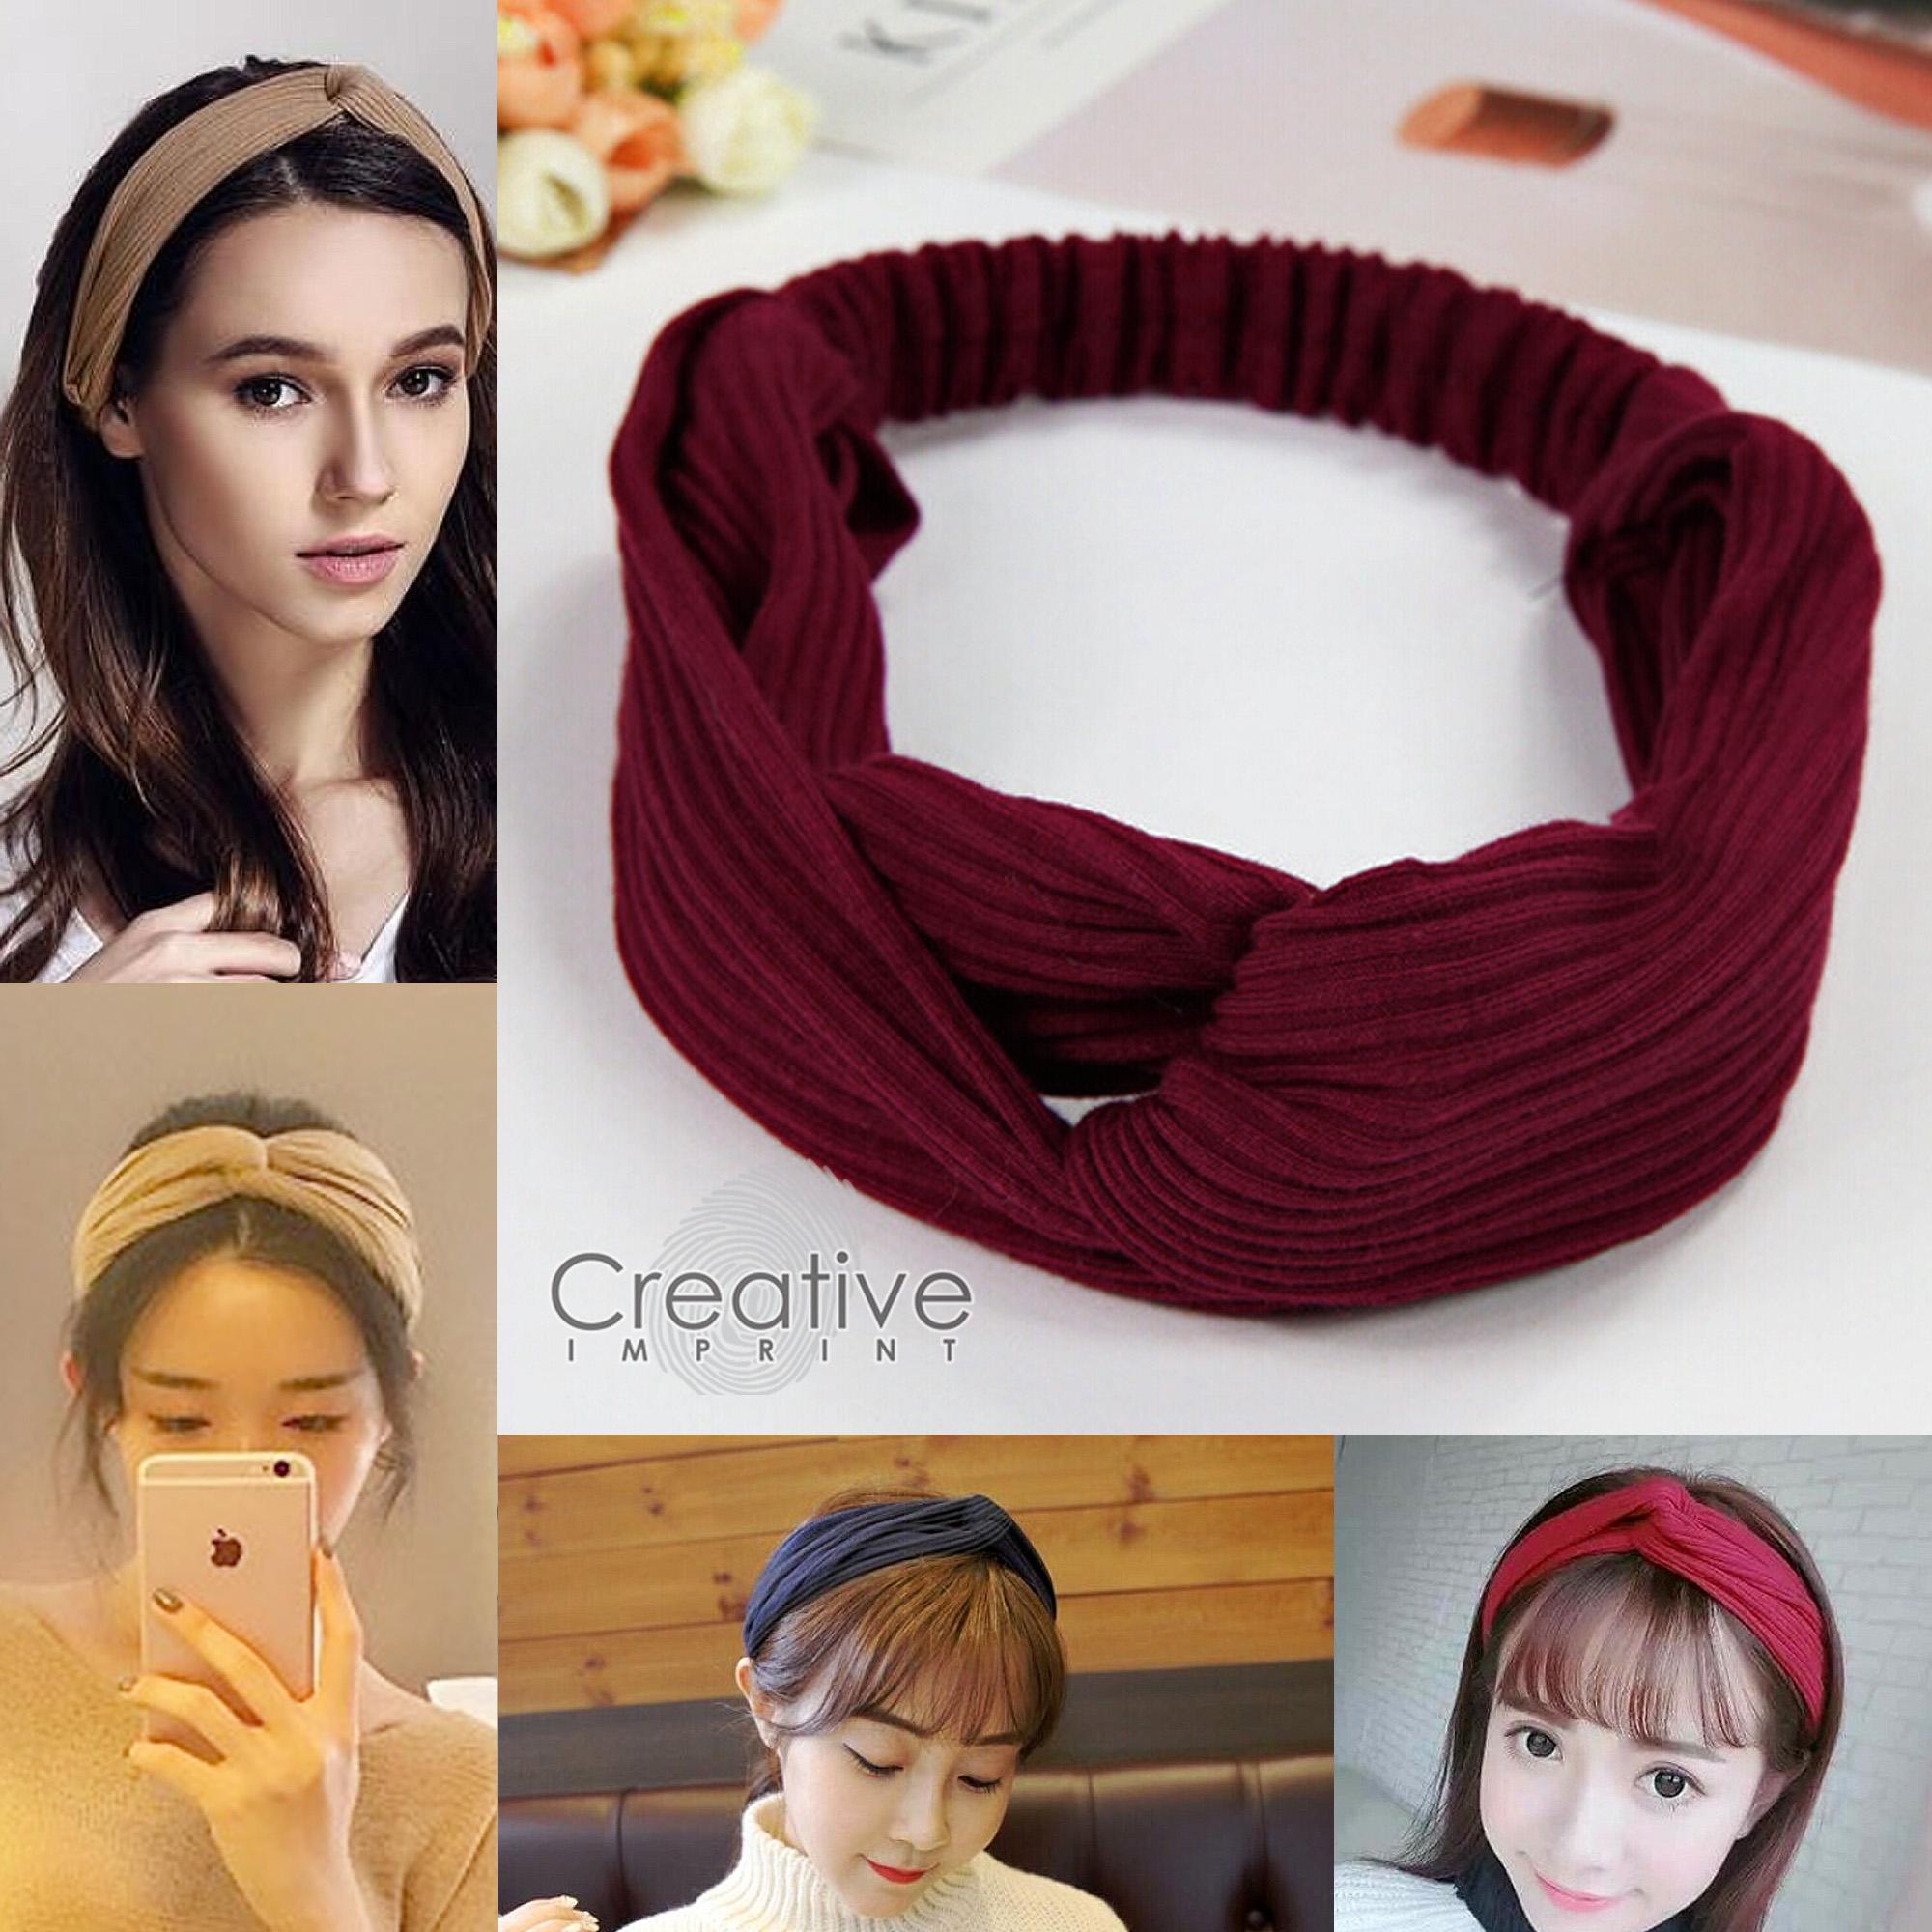 ef0d2f32bcb Creative Imprint Korean Hair Turban Headband Hairband Elastic Knot Style  Head Wrap Stretchable Garterized Cute -